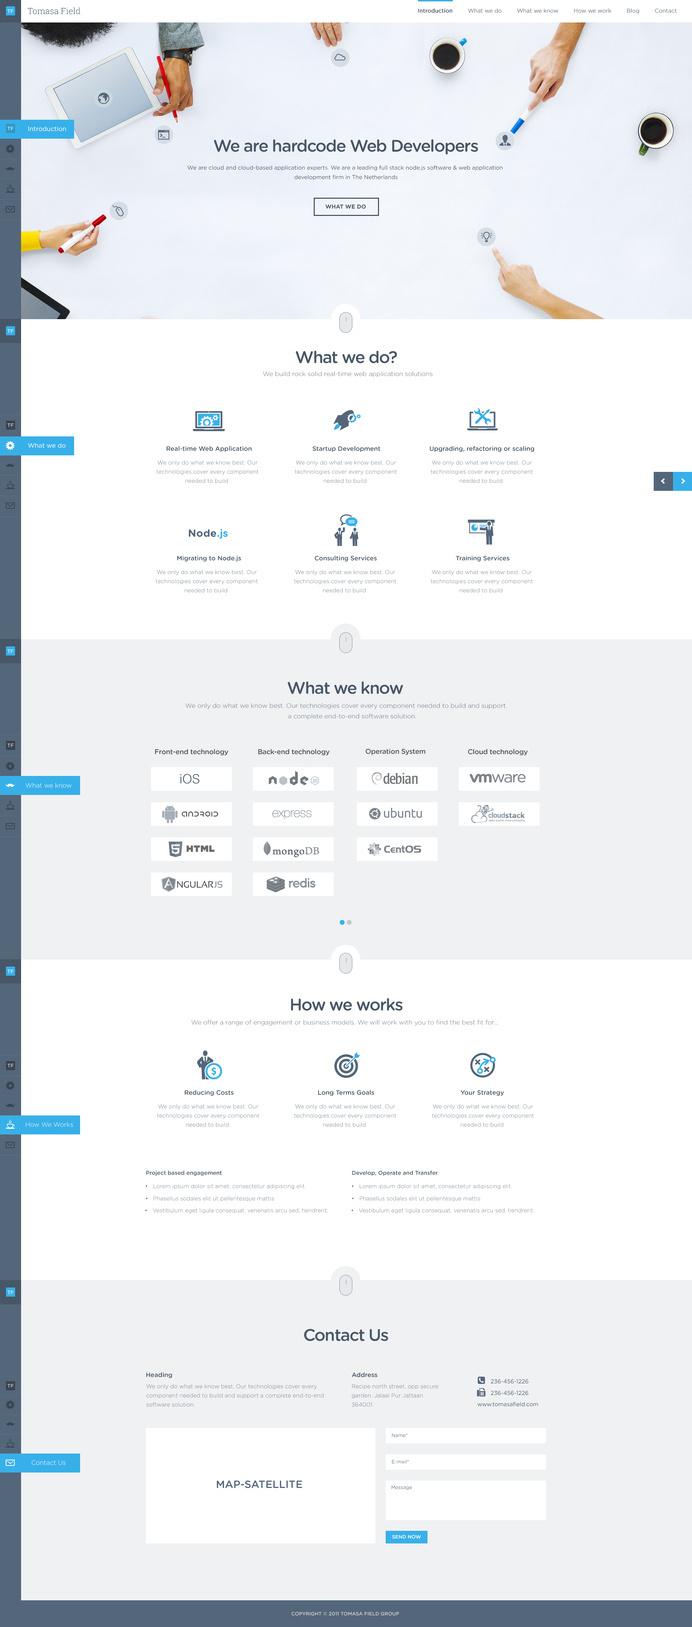 Tomasa Field Website Design by Sunil Joshi #page #site #design #company #web #landing